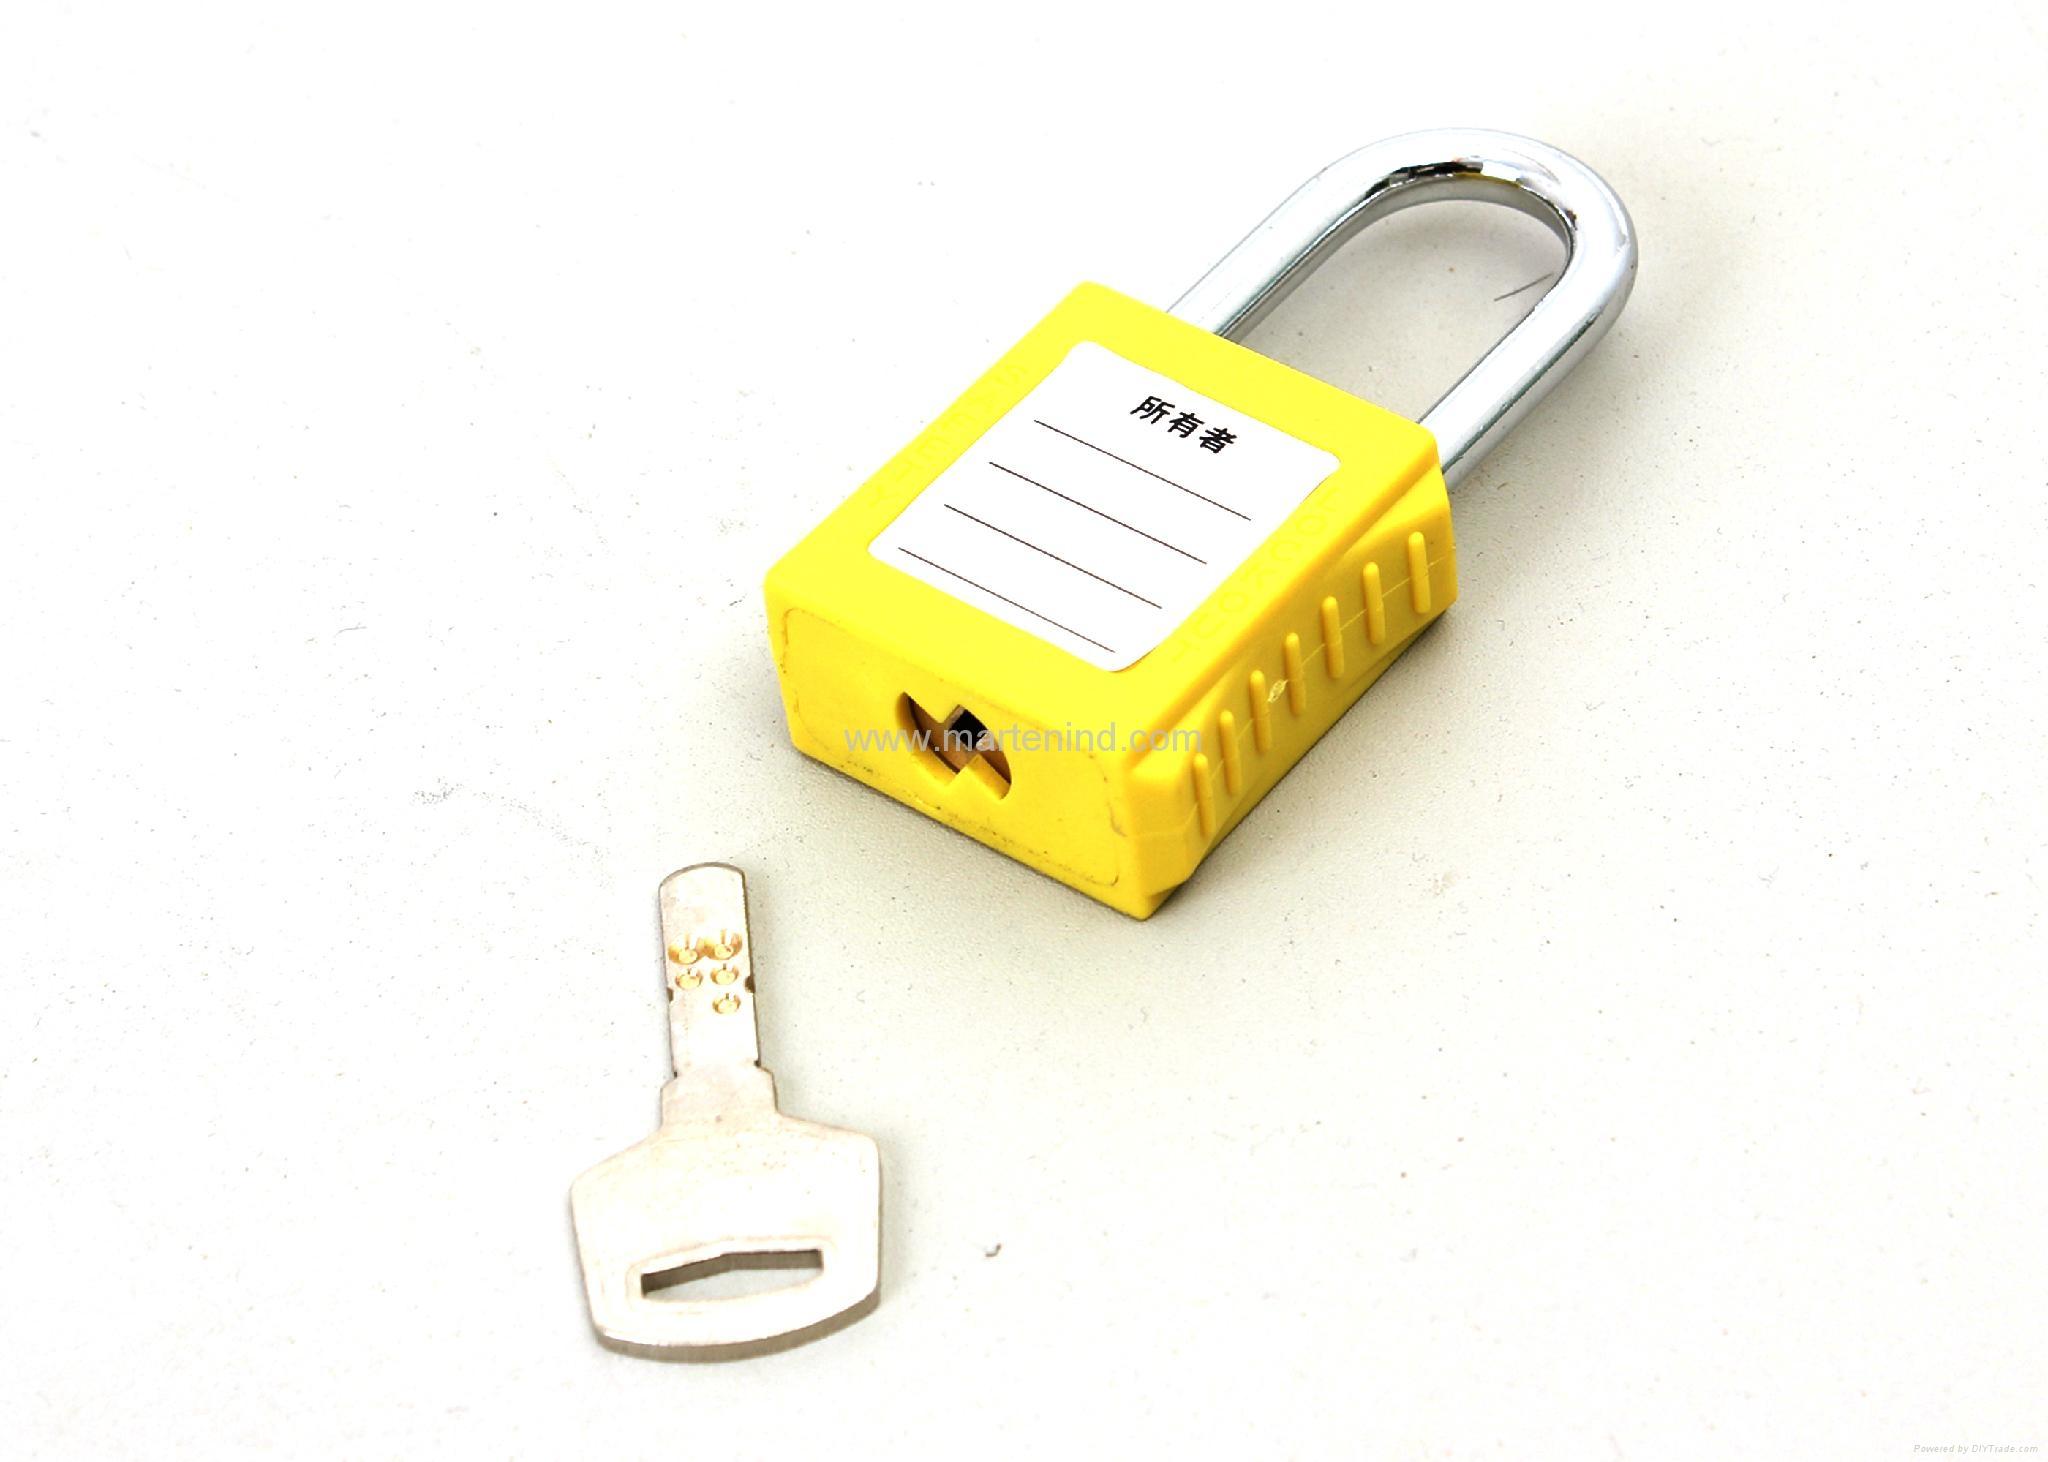 G01 38cm 6mm lockout safety padlock